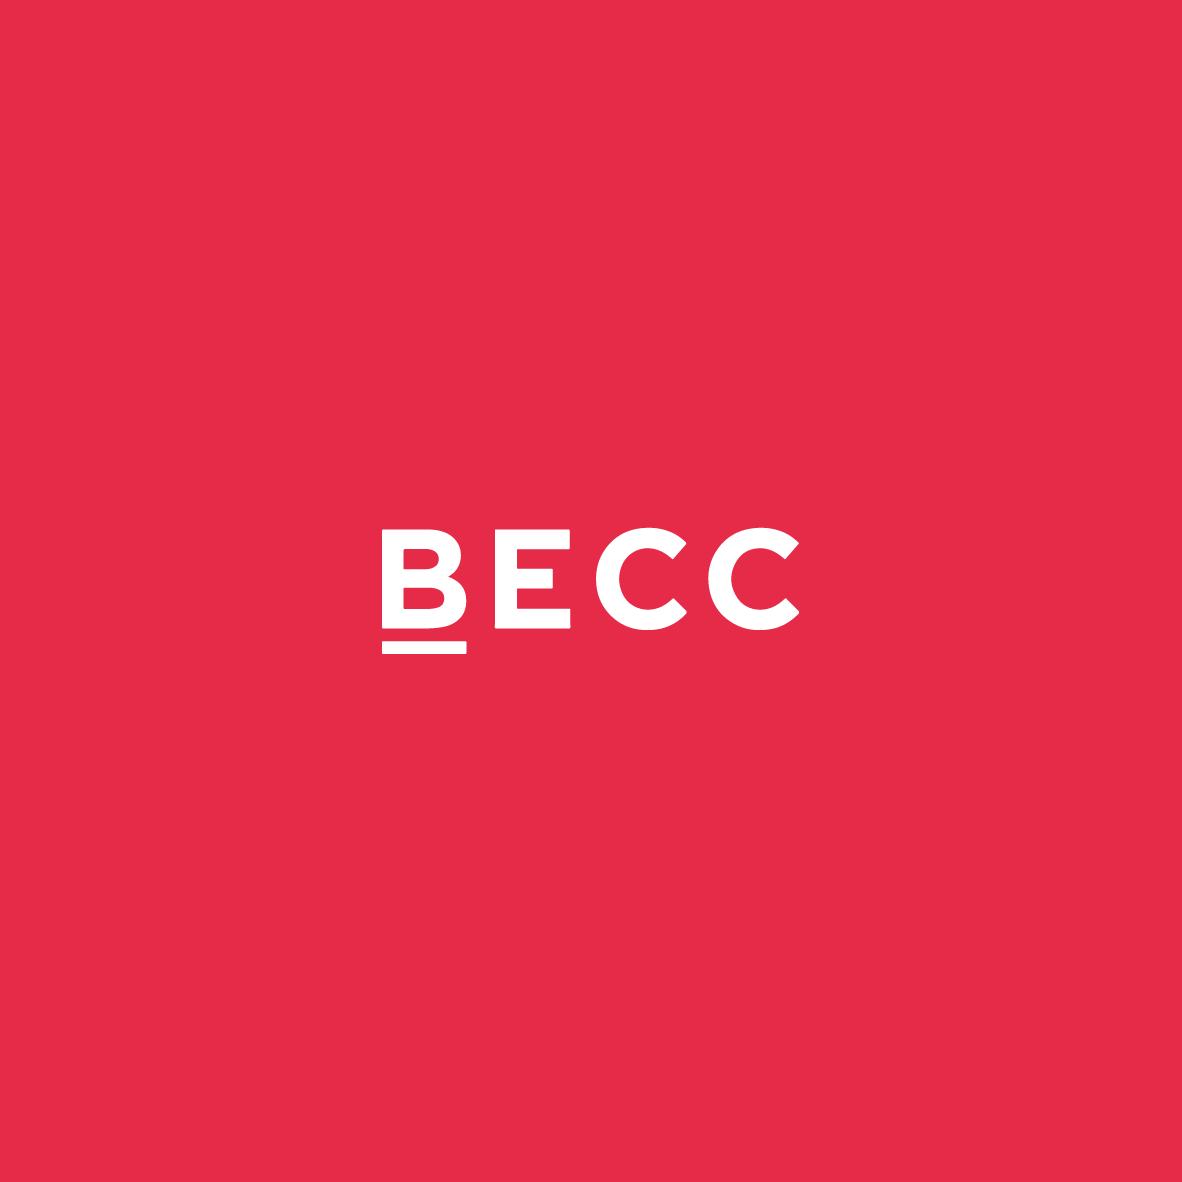 41_BECC AGENCY.png